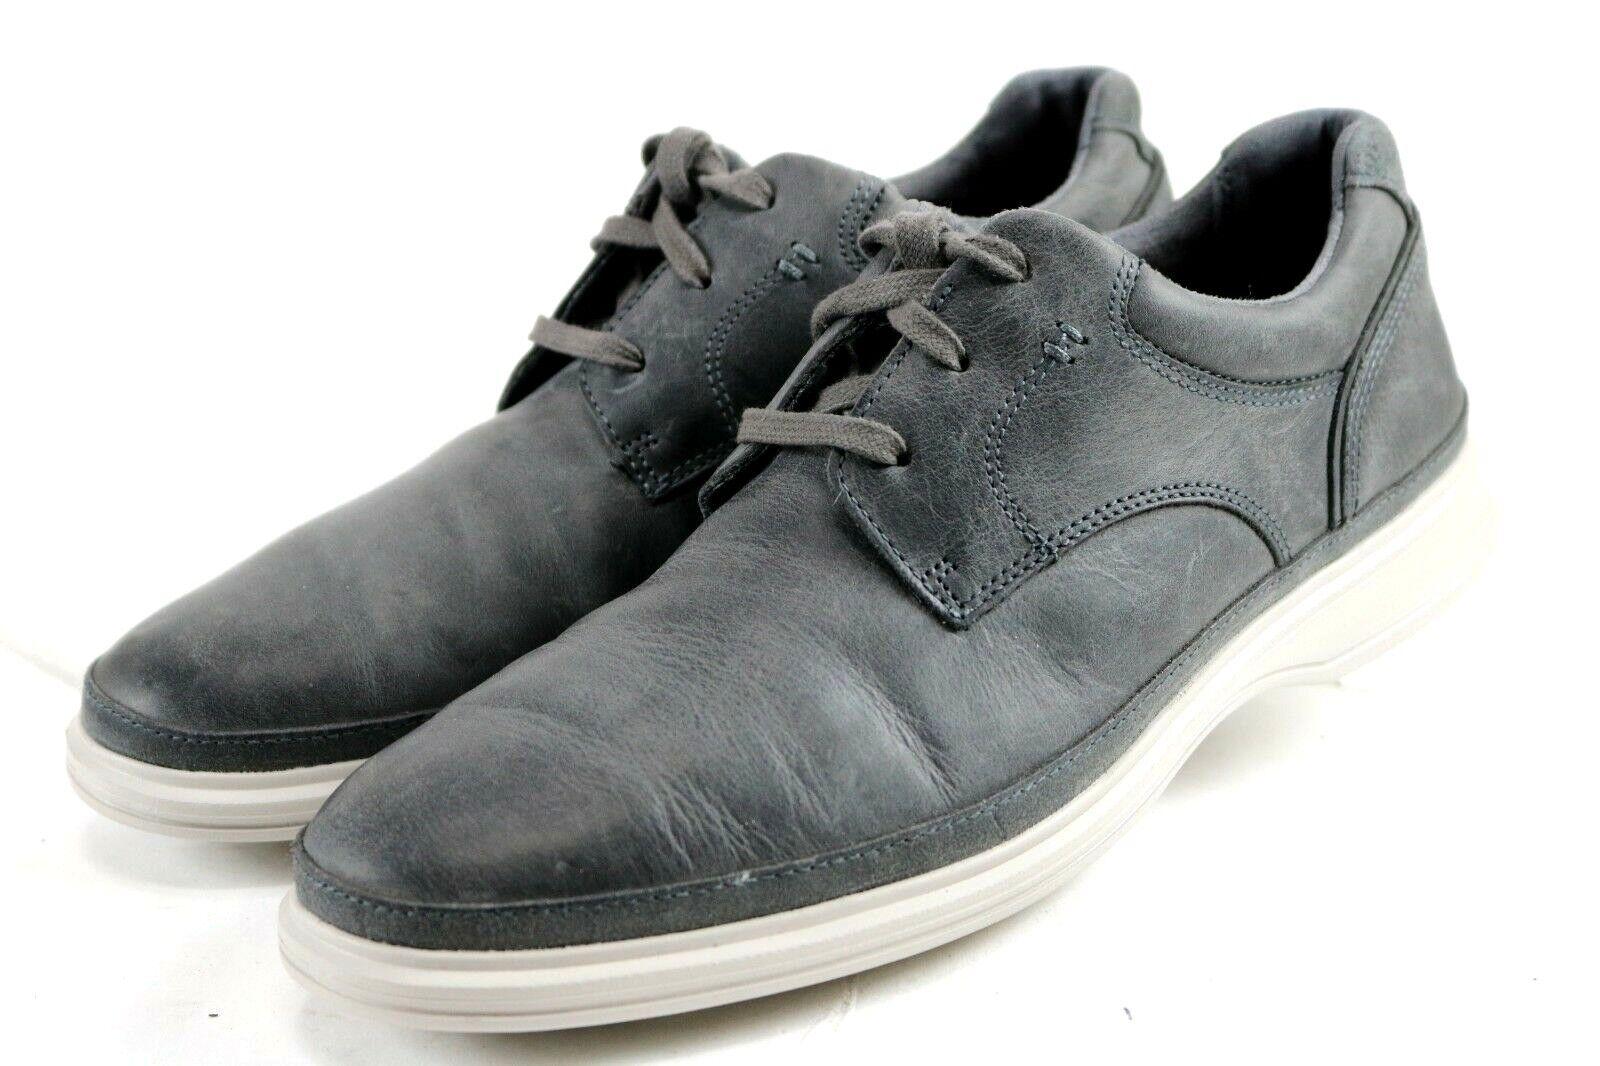 Rockport DresSports II Go Plain Toe  120 Men's Oxford shoes Size 7.5 Dark Grey